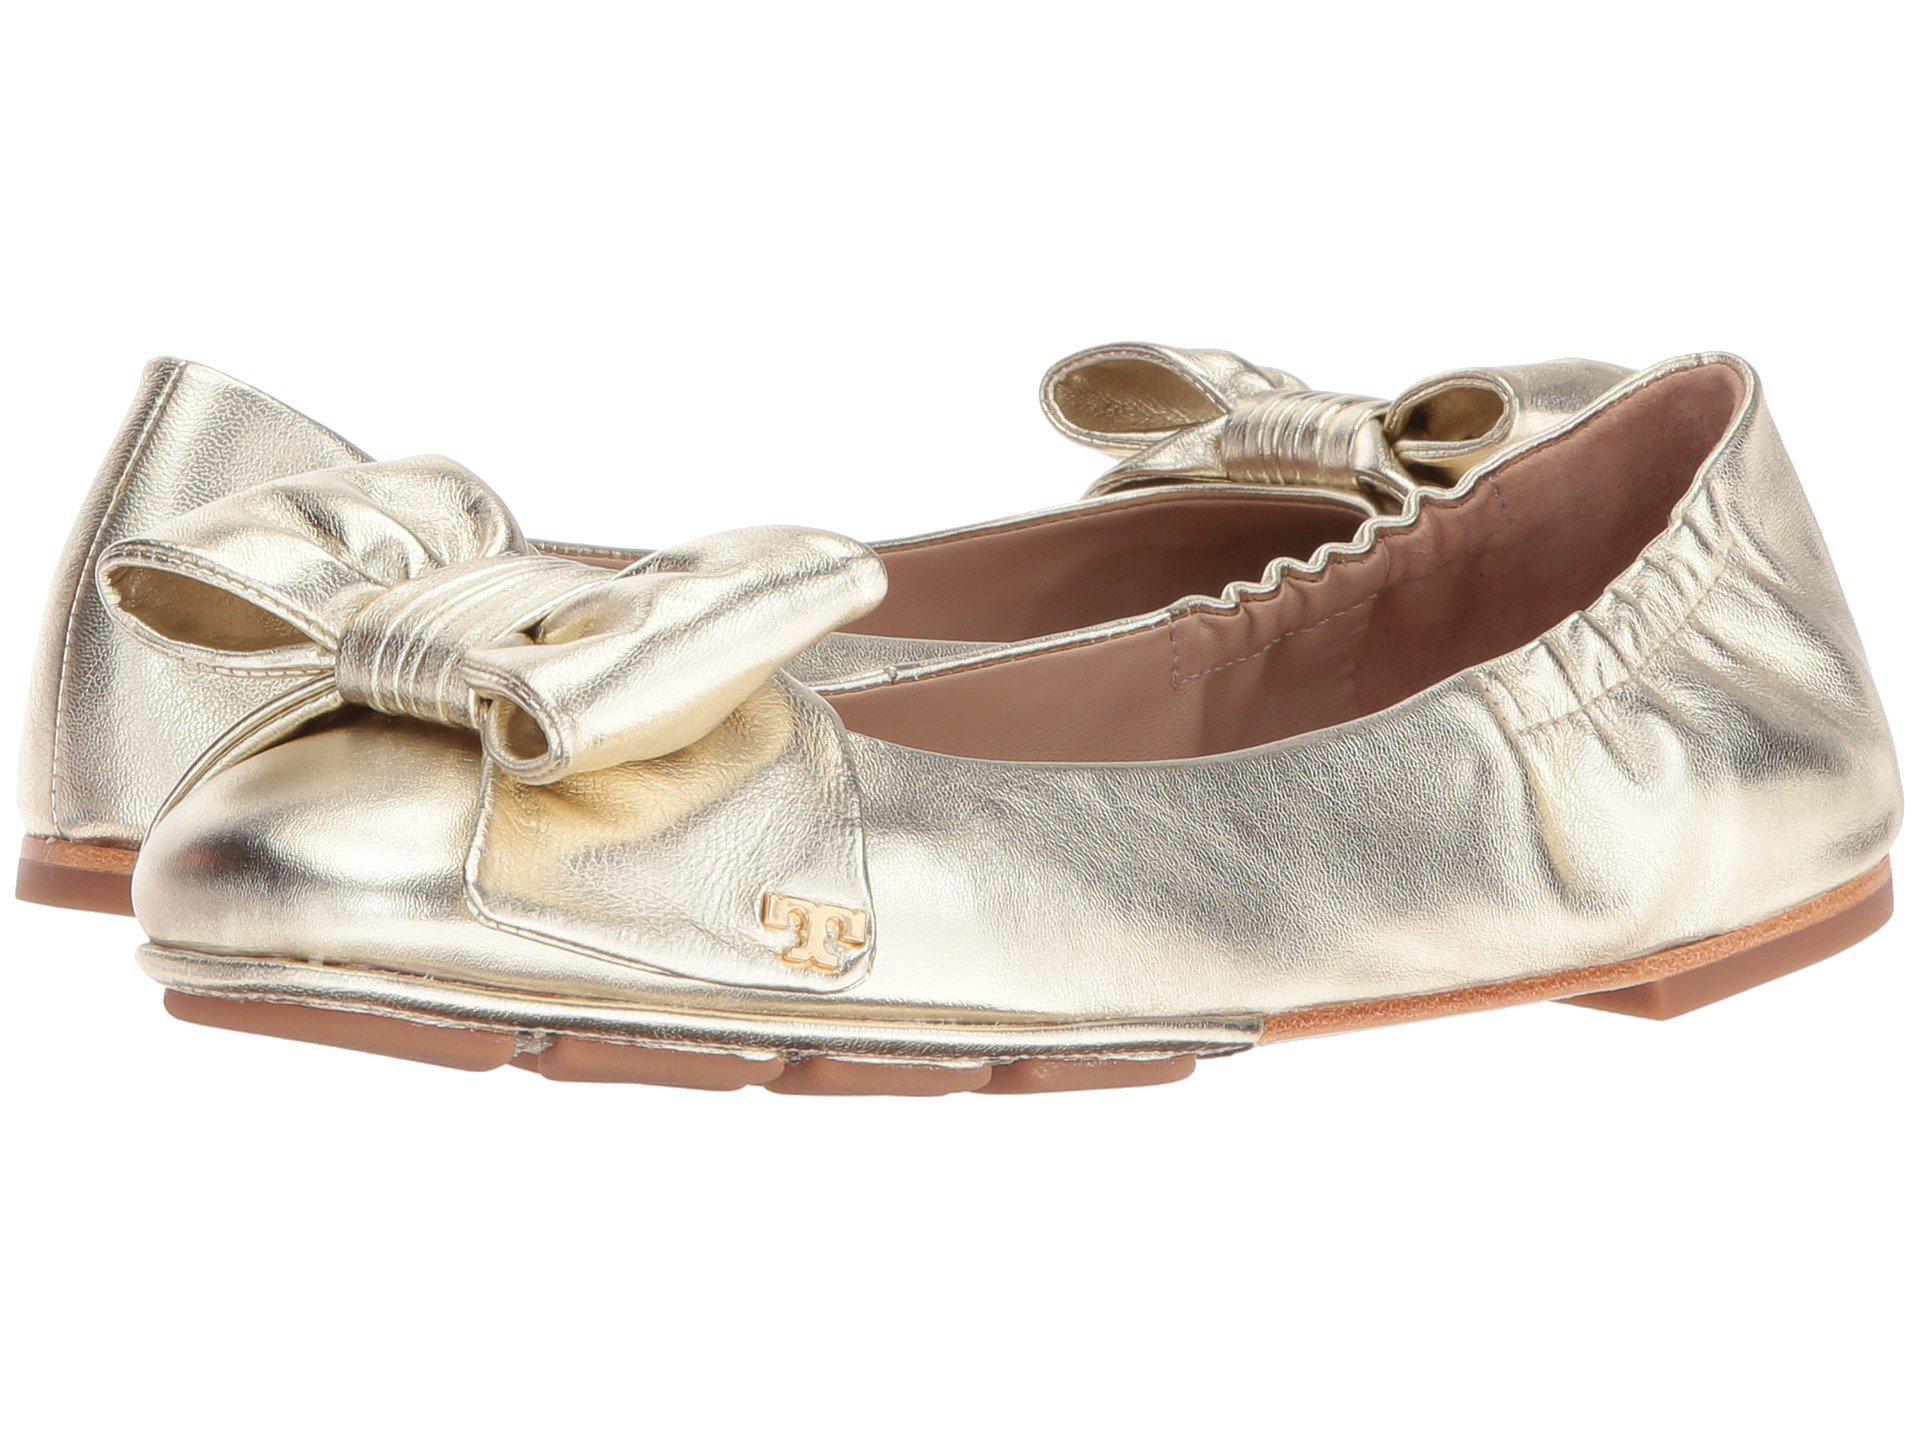 21f1b0f9da1d Lyst - Tory Burch Divine Bow Driver Ballet